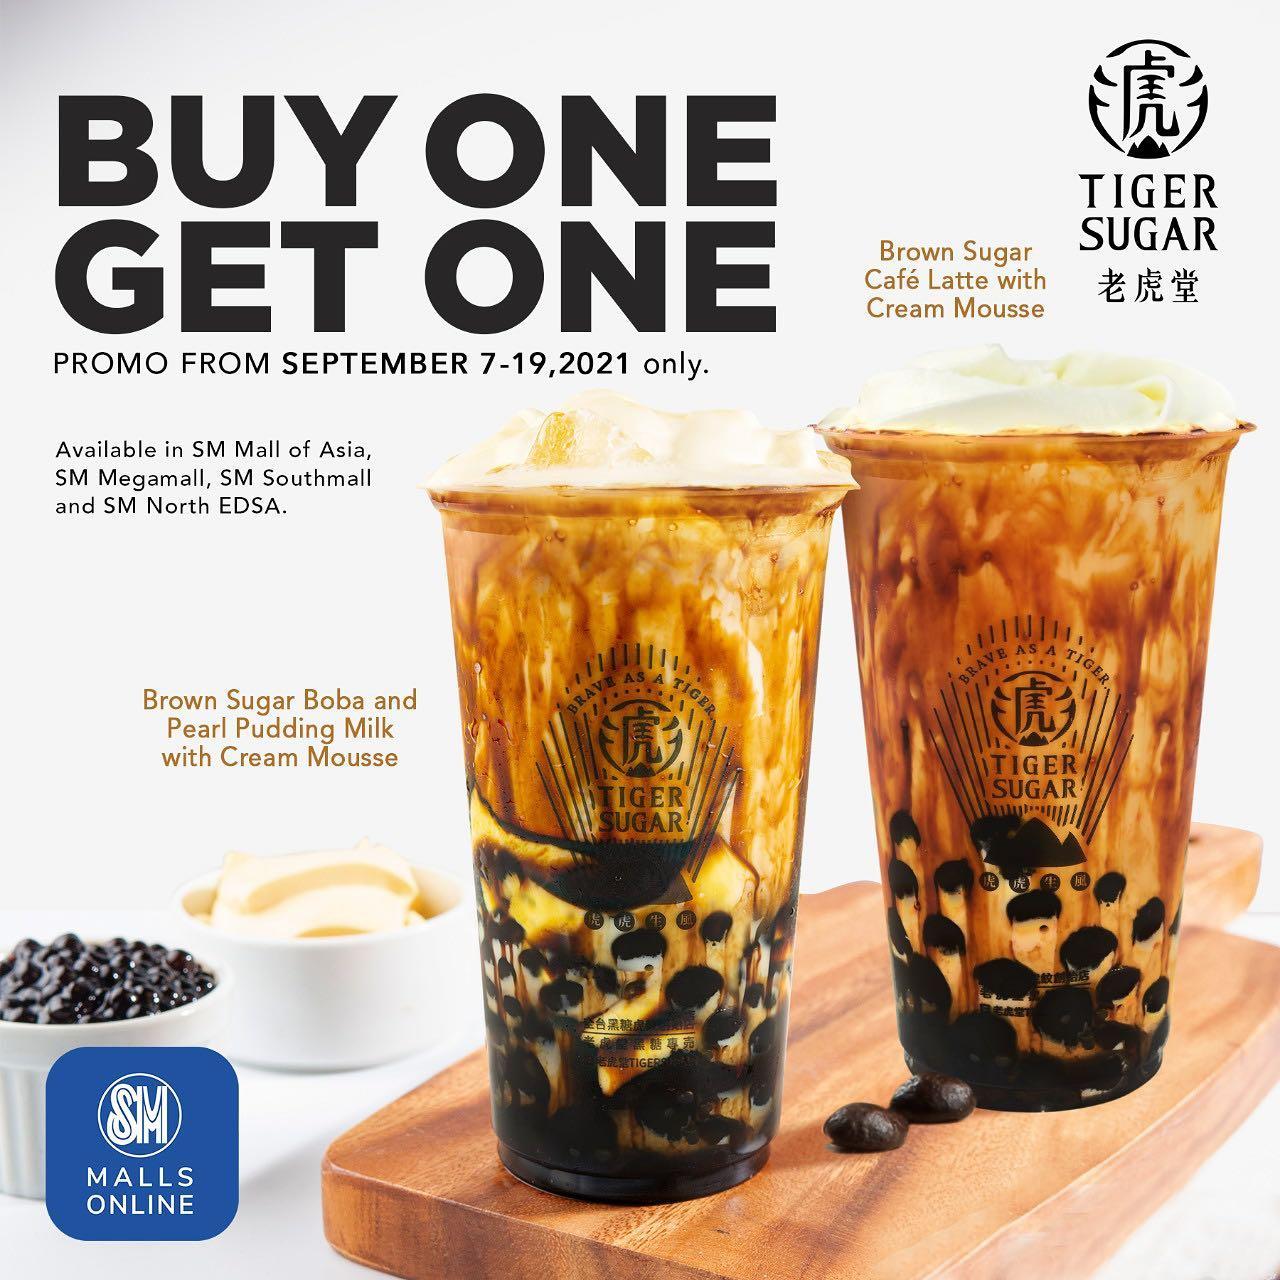 Tiger Sugar Buy 1 Get 1 SM Malls Online